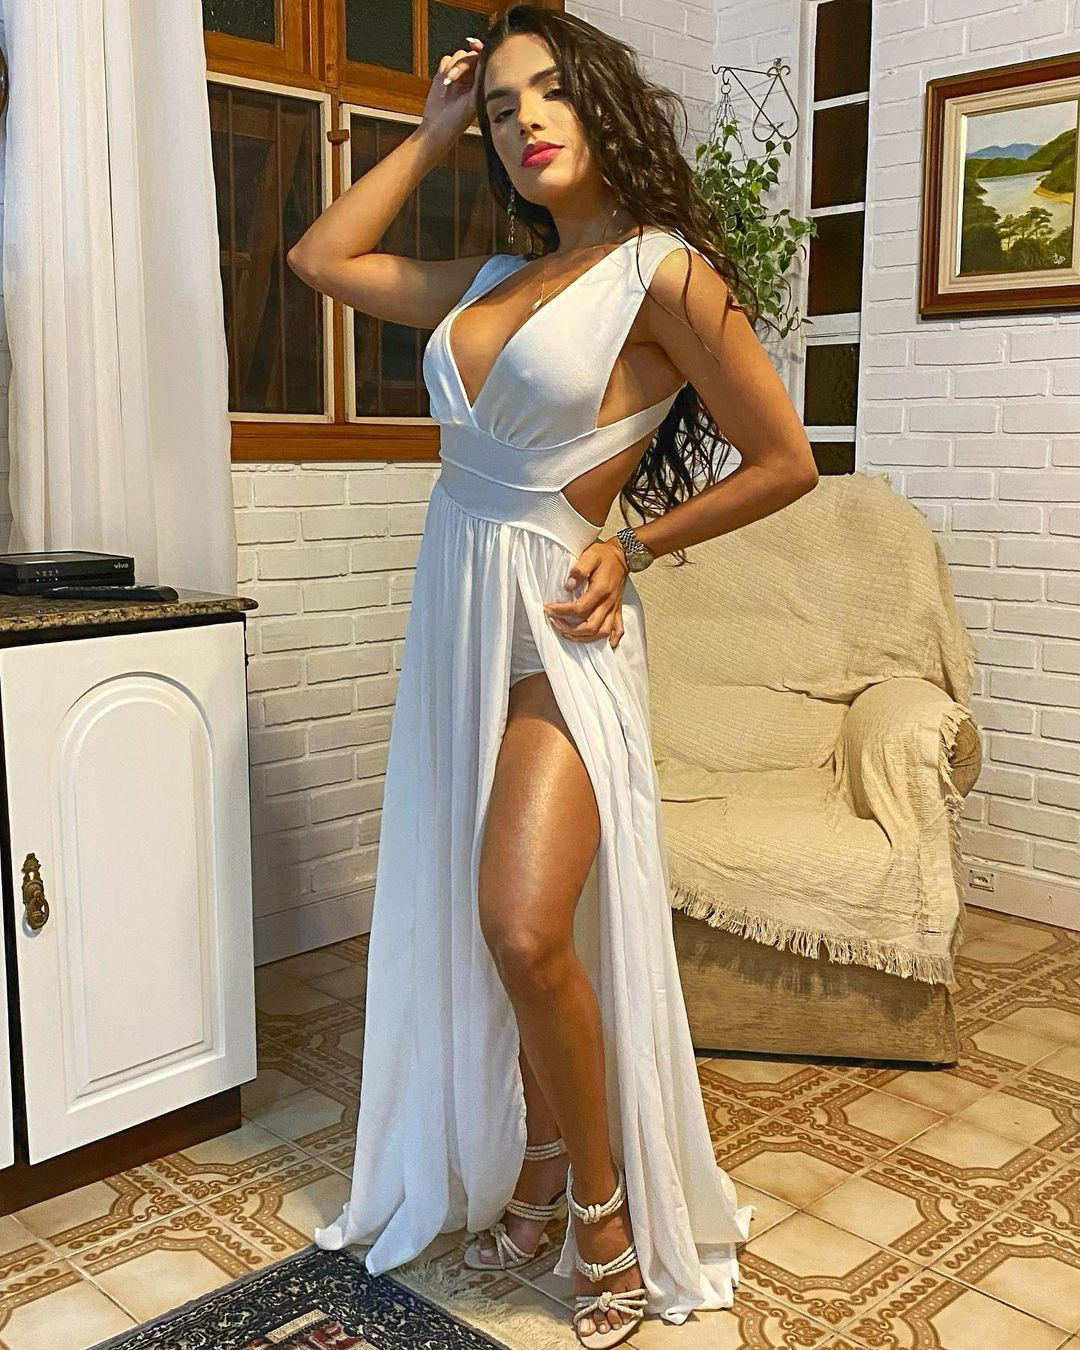 Kedma Oliveira.